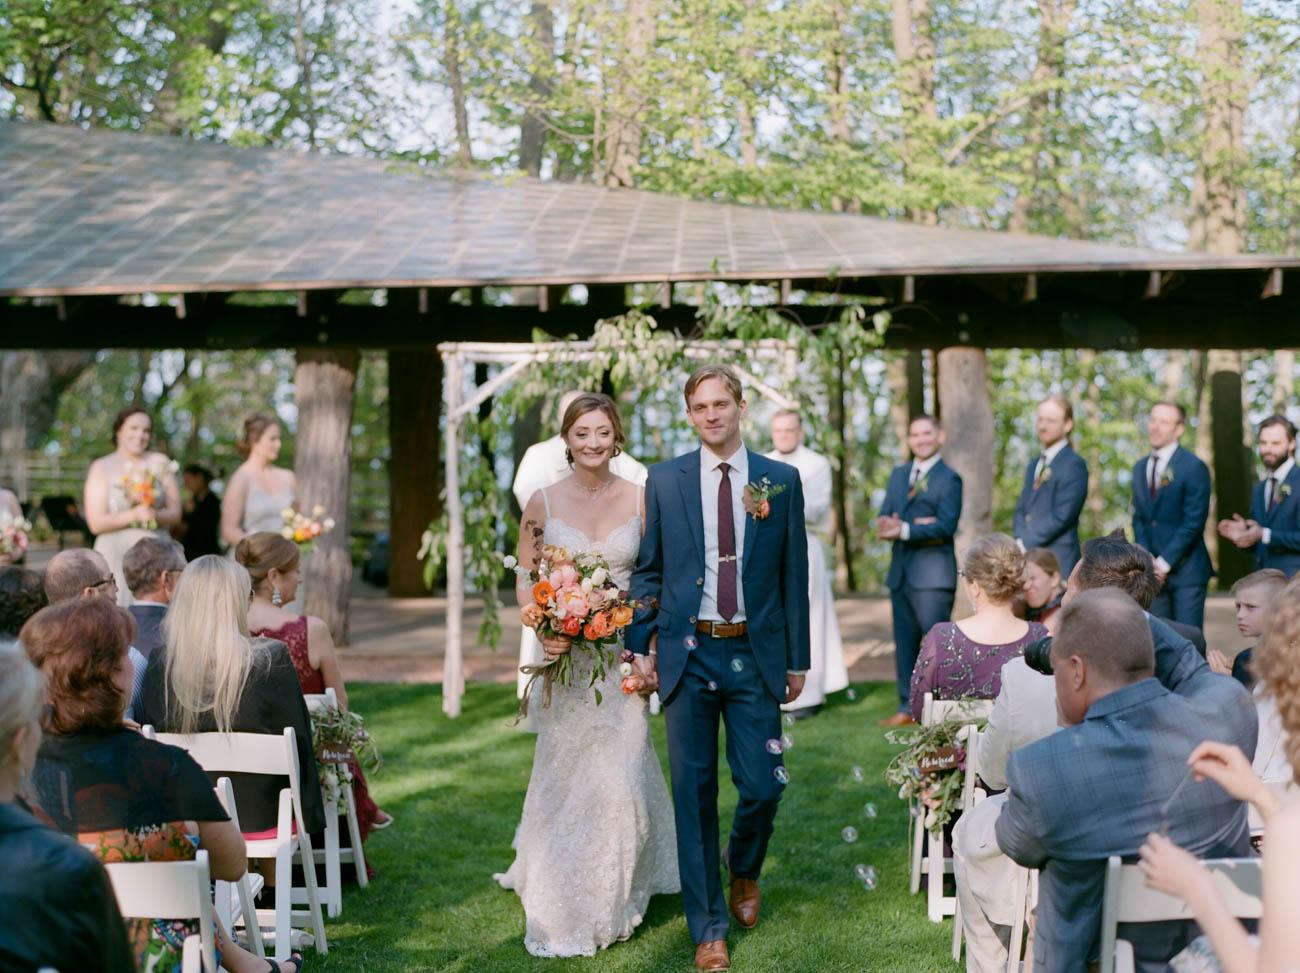 kateweinsteinphoto_schlitz_audubon_milwaukee_wedding-206.jpg